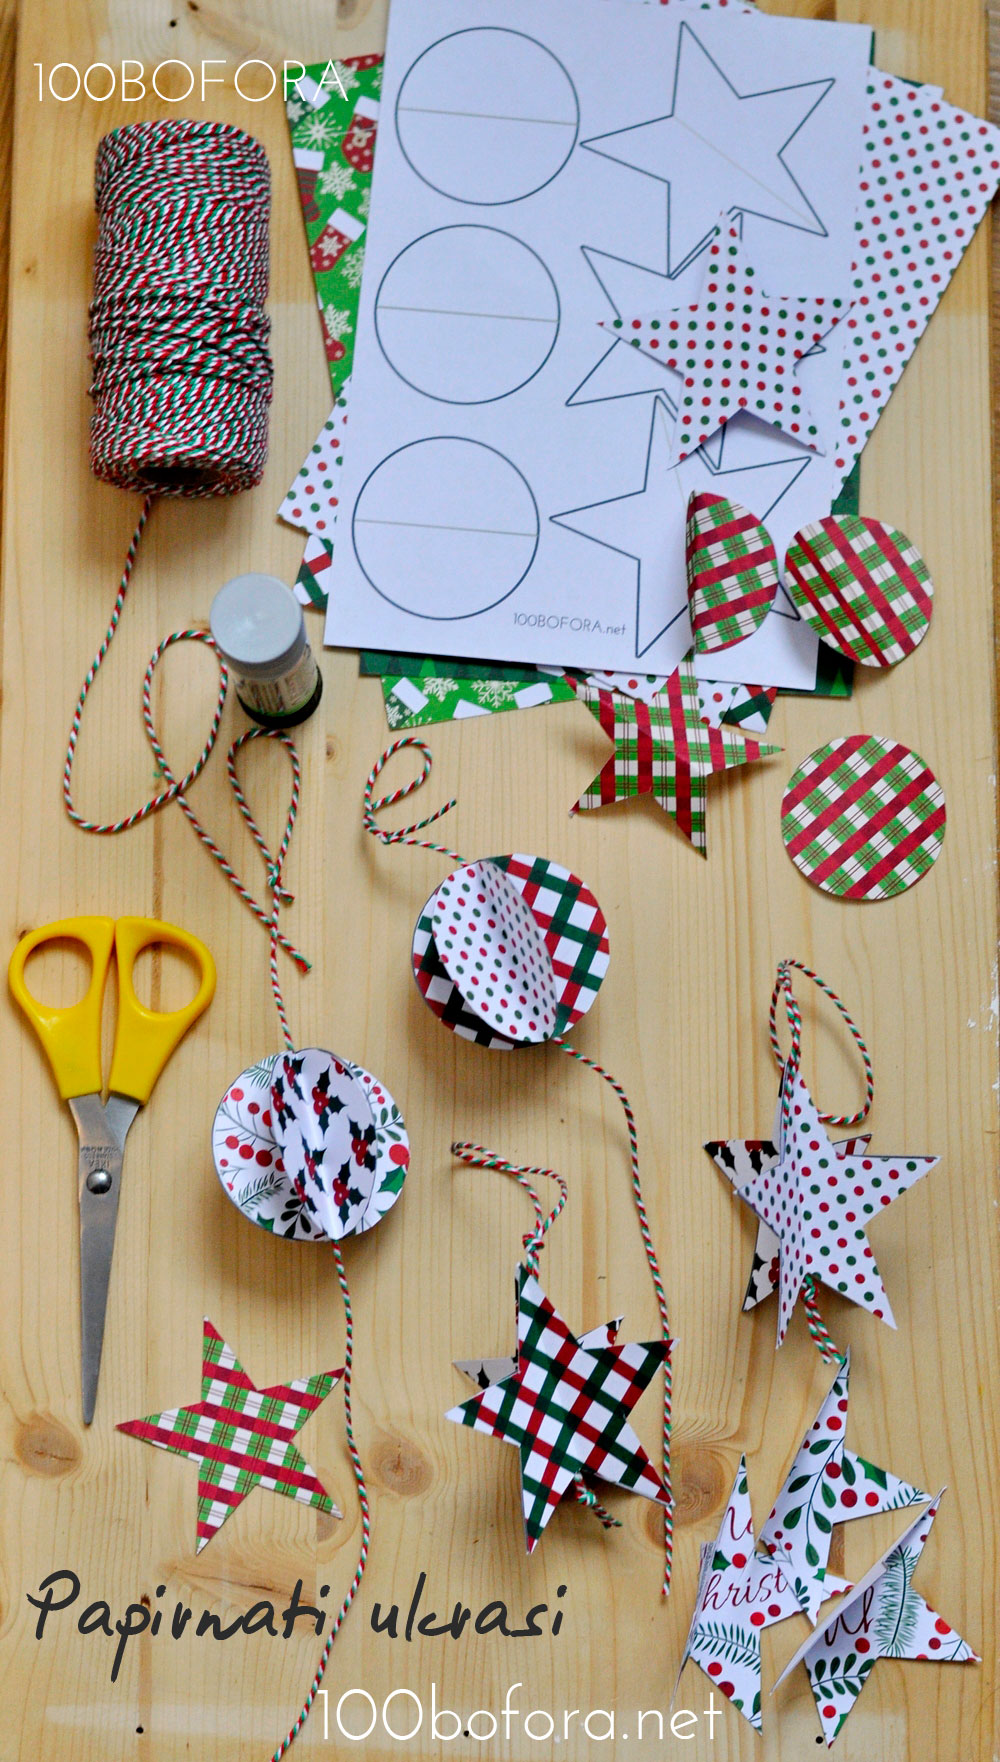 Kako napraviti papirnate ukrase